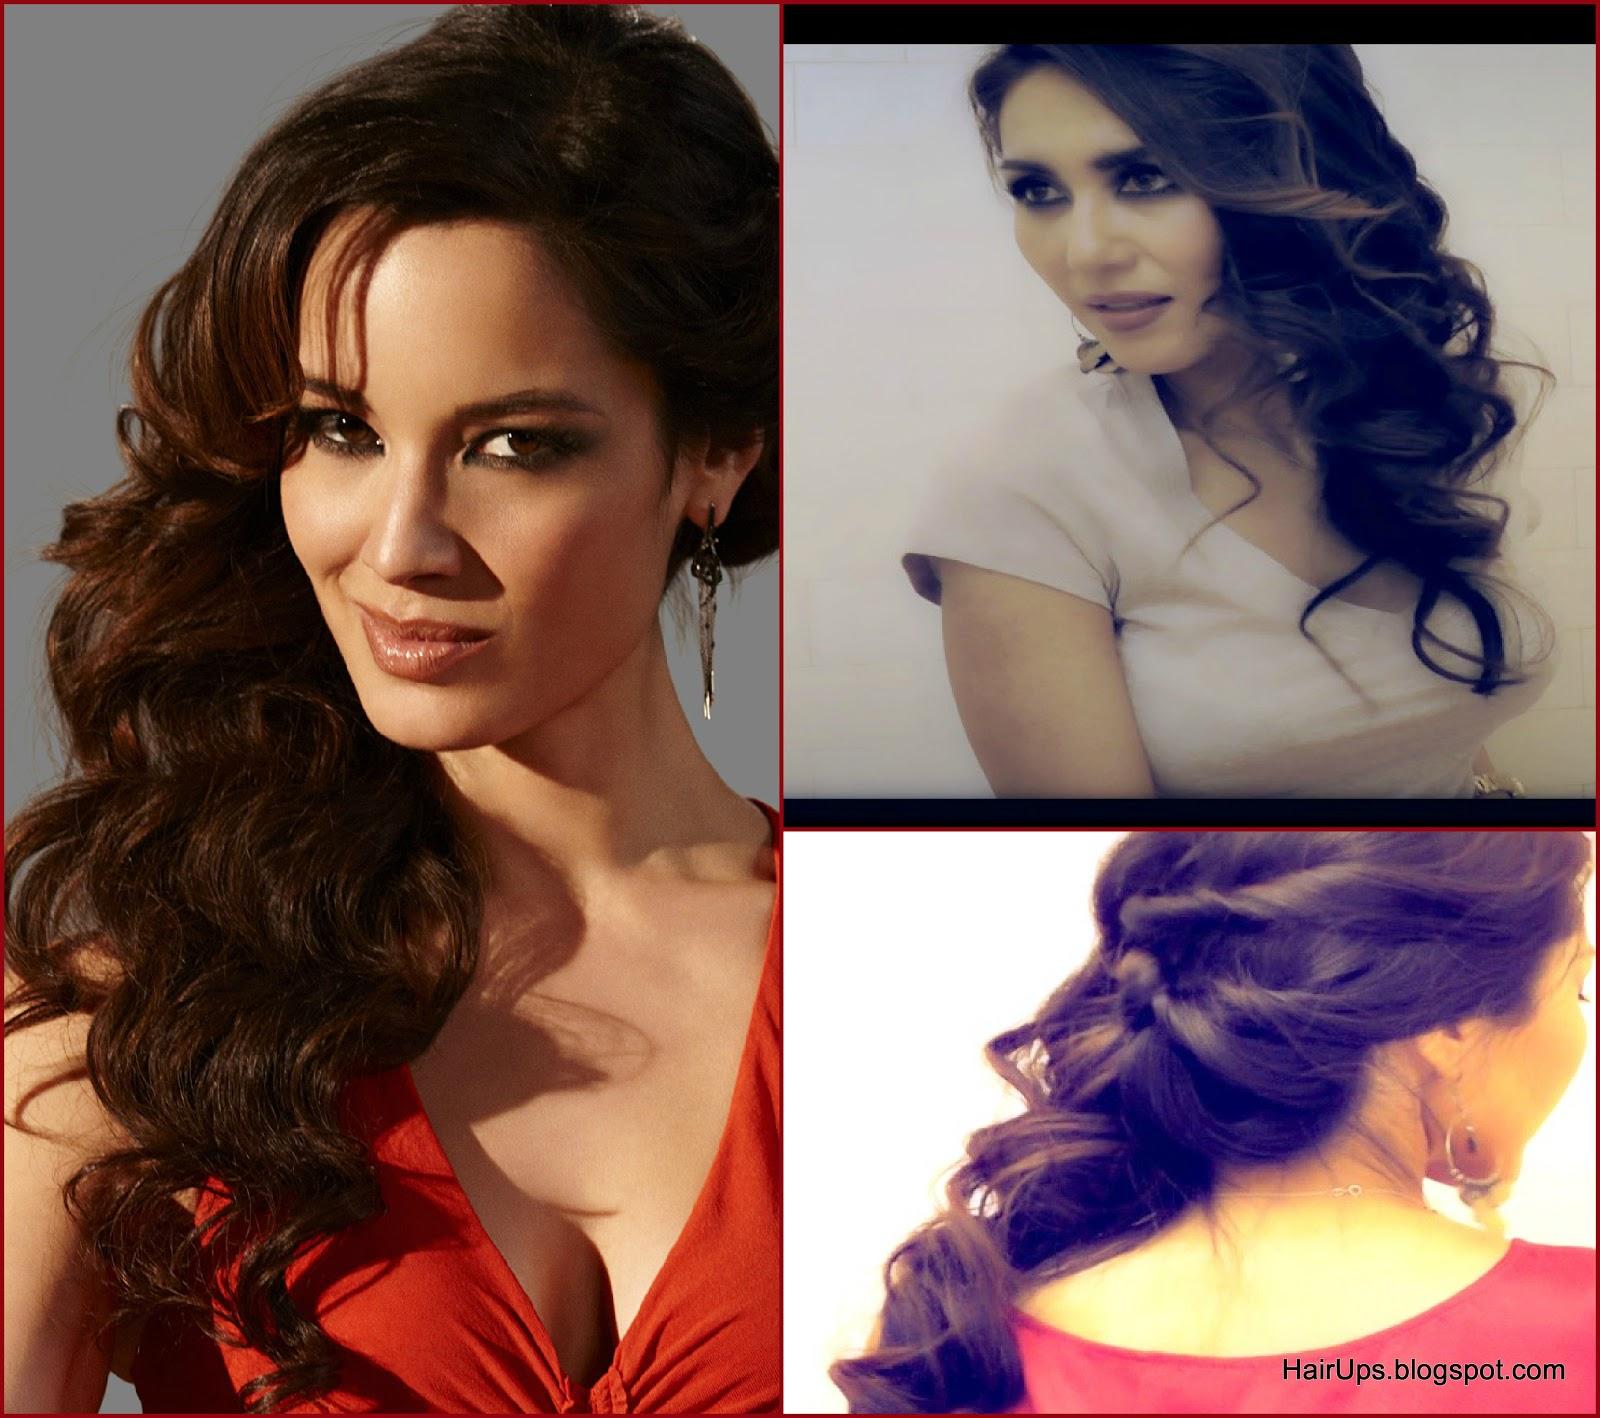 Awesome 007 Bond Girl Side Curly Half Up Hairstyles Cute Hair Tutorial Video Short Hairstyles Gunalazisus